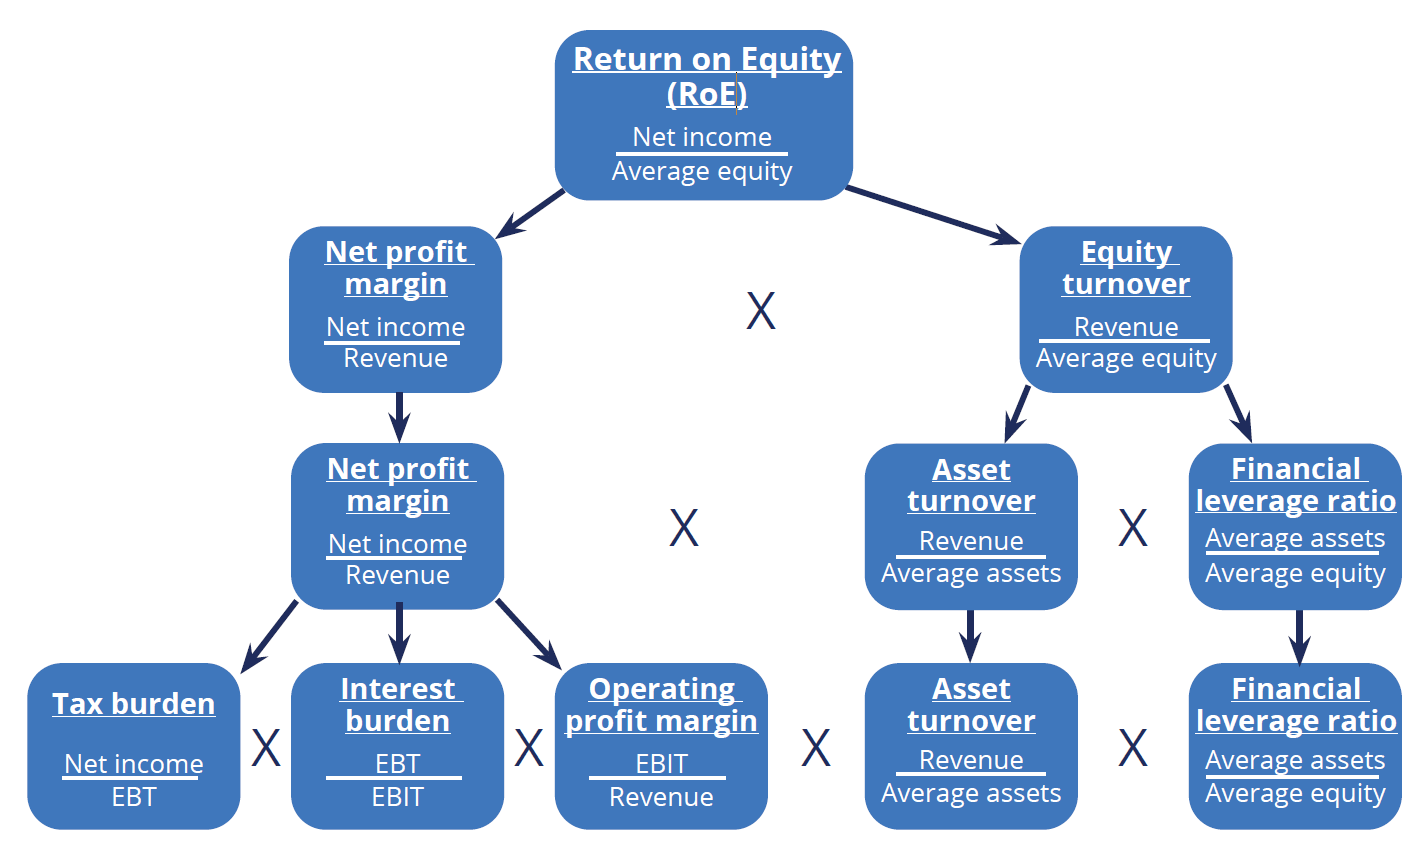 DuPont Analysis Scheme